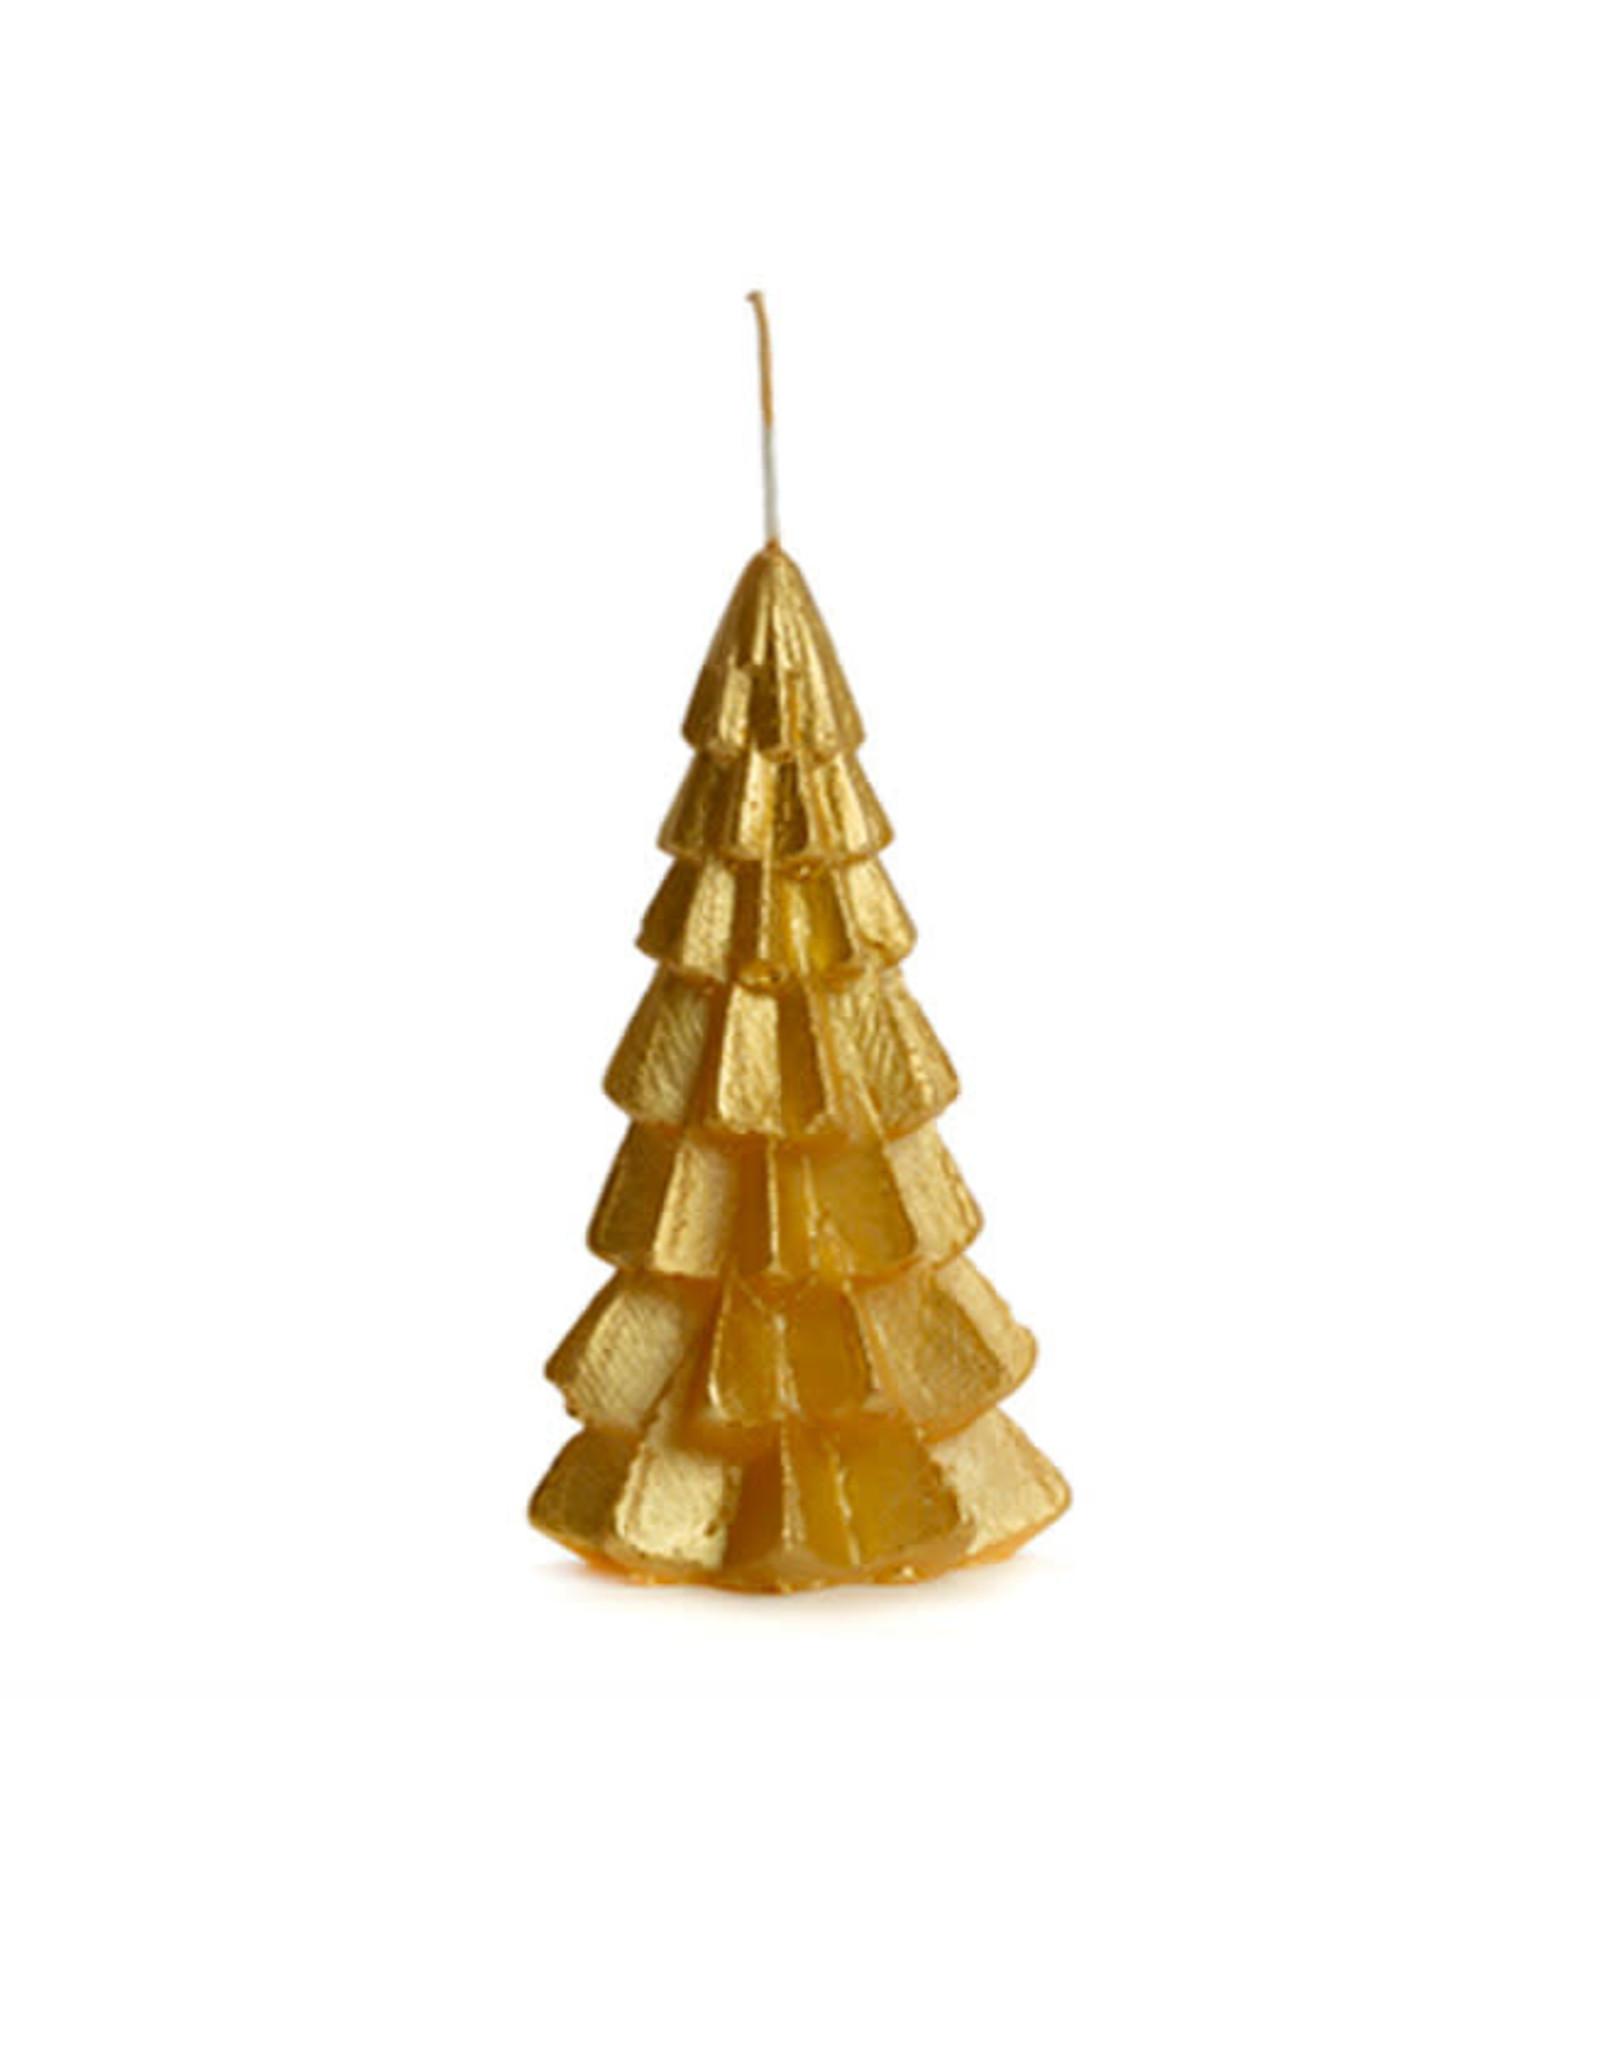 Rustik Lys Xmas Tree Candle 6x12cm-gold